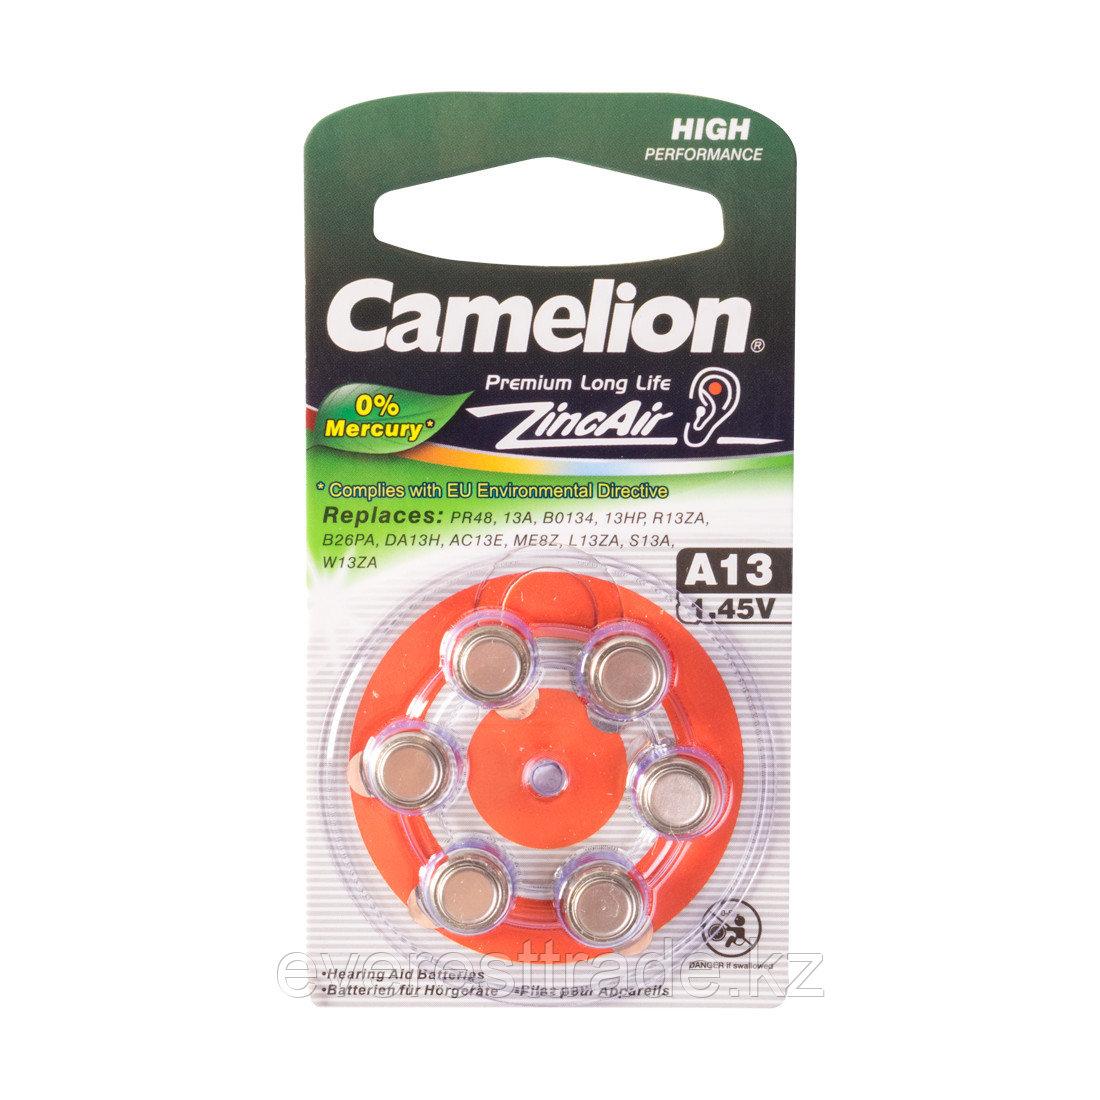 Camelion Батарейки,CAMELION, A13-BP6(0%Hg), Zinc Air, A13, 1.45V, 0% Ртути, 6 шт., Блистер